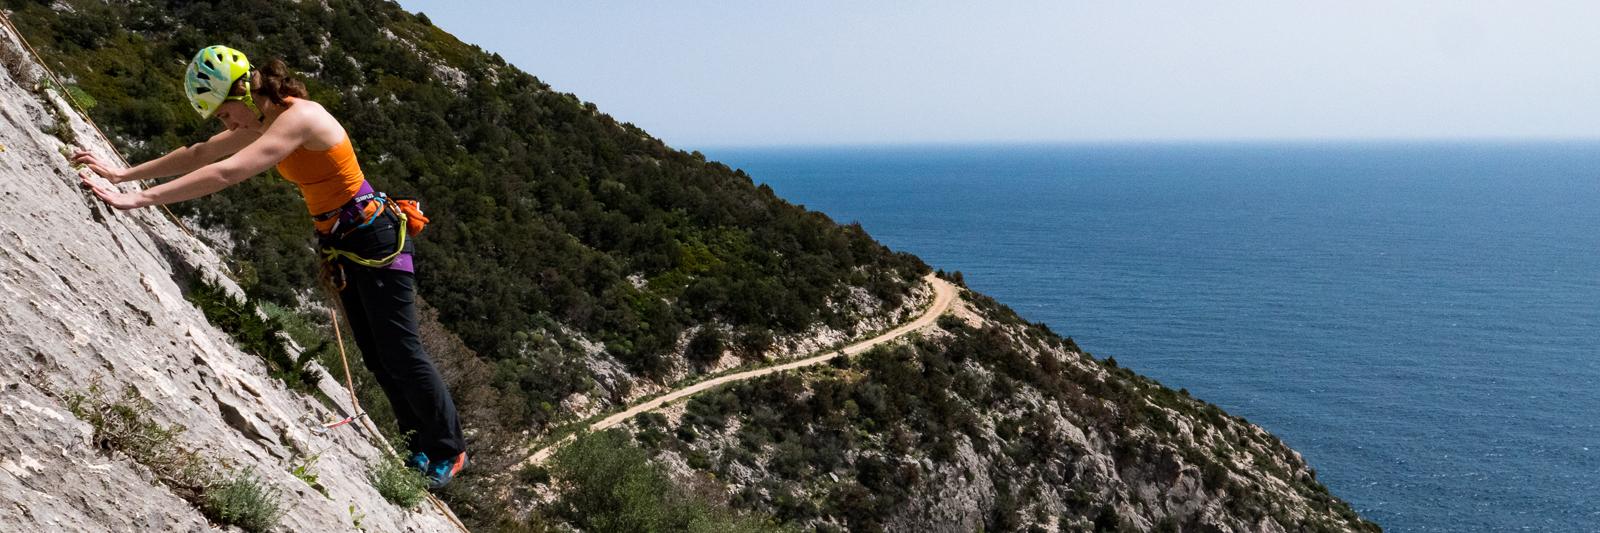 Sport-Climbing-Holiday-Sardinia-Banner_5417